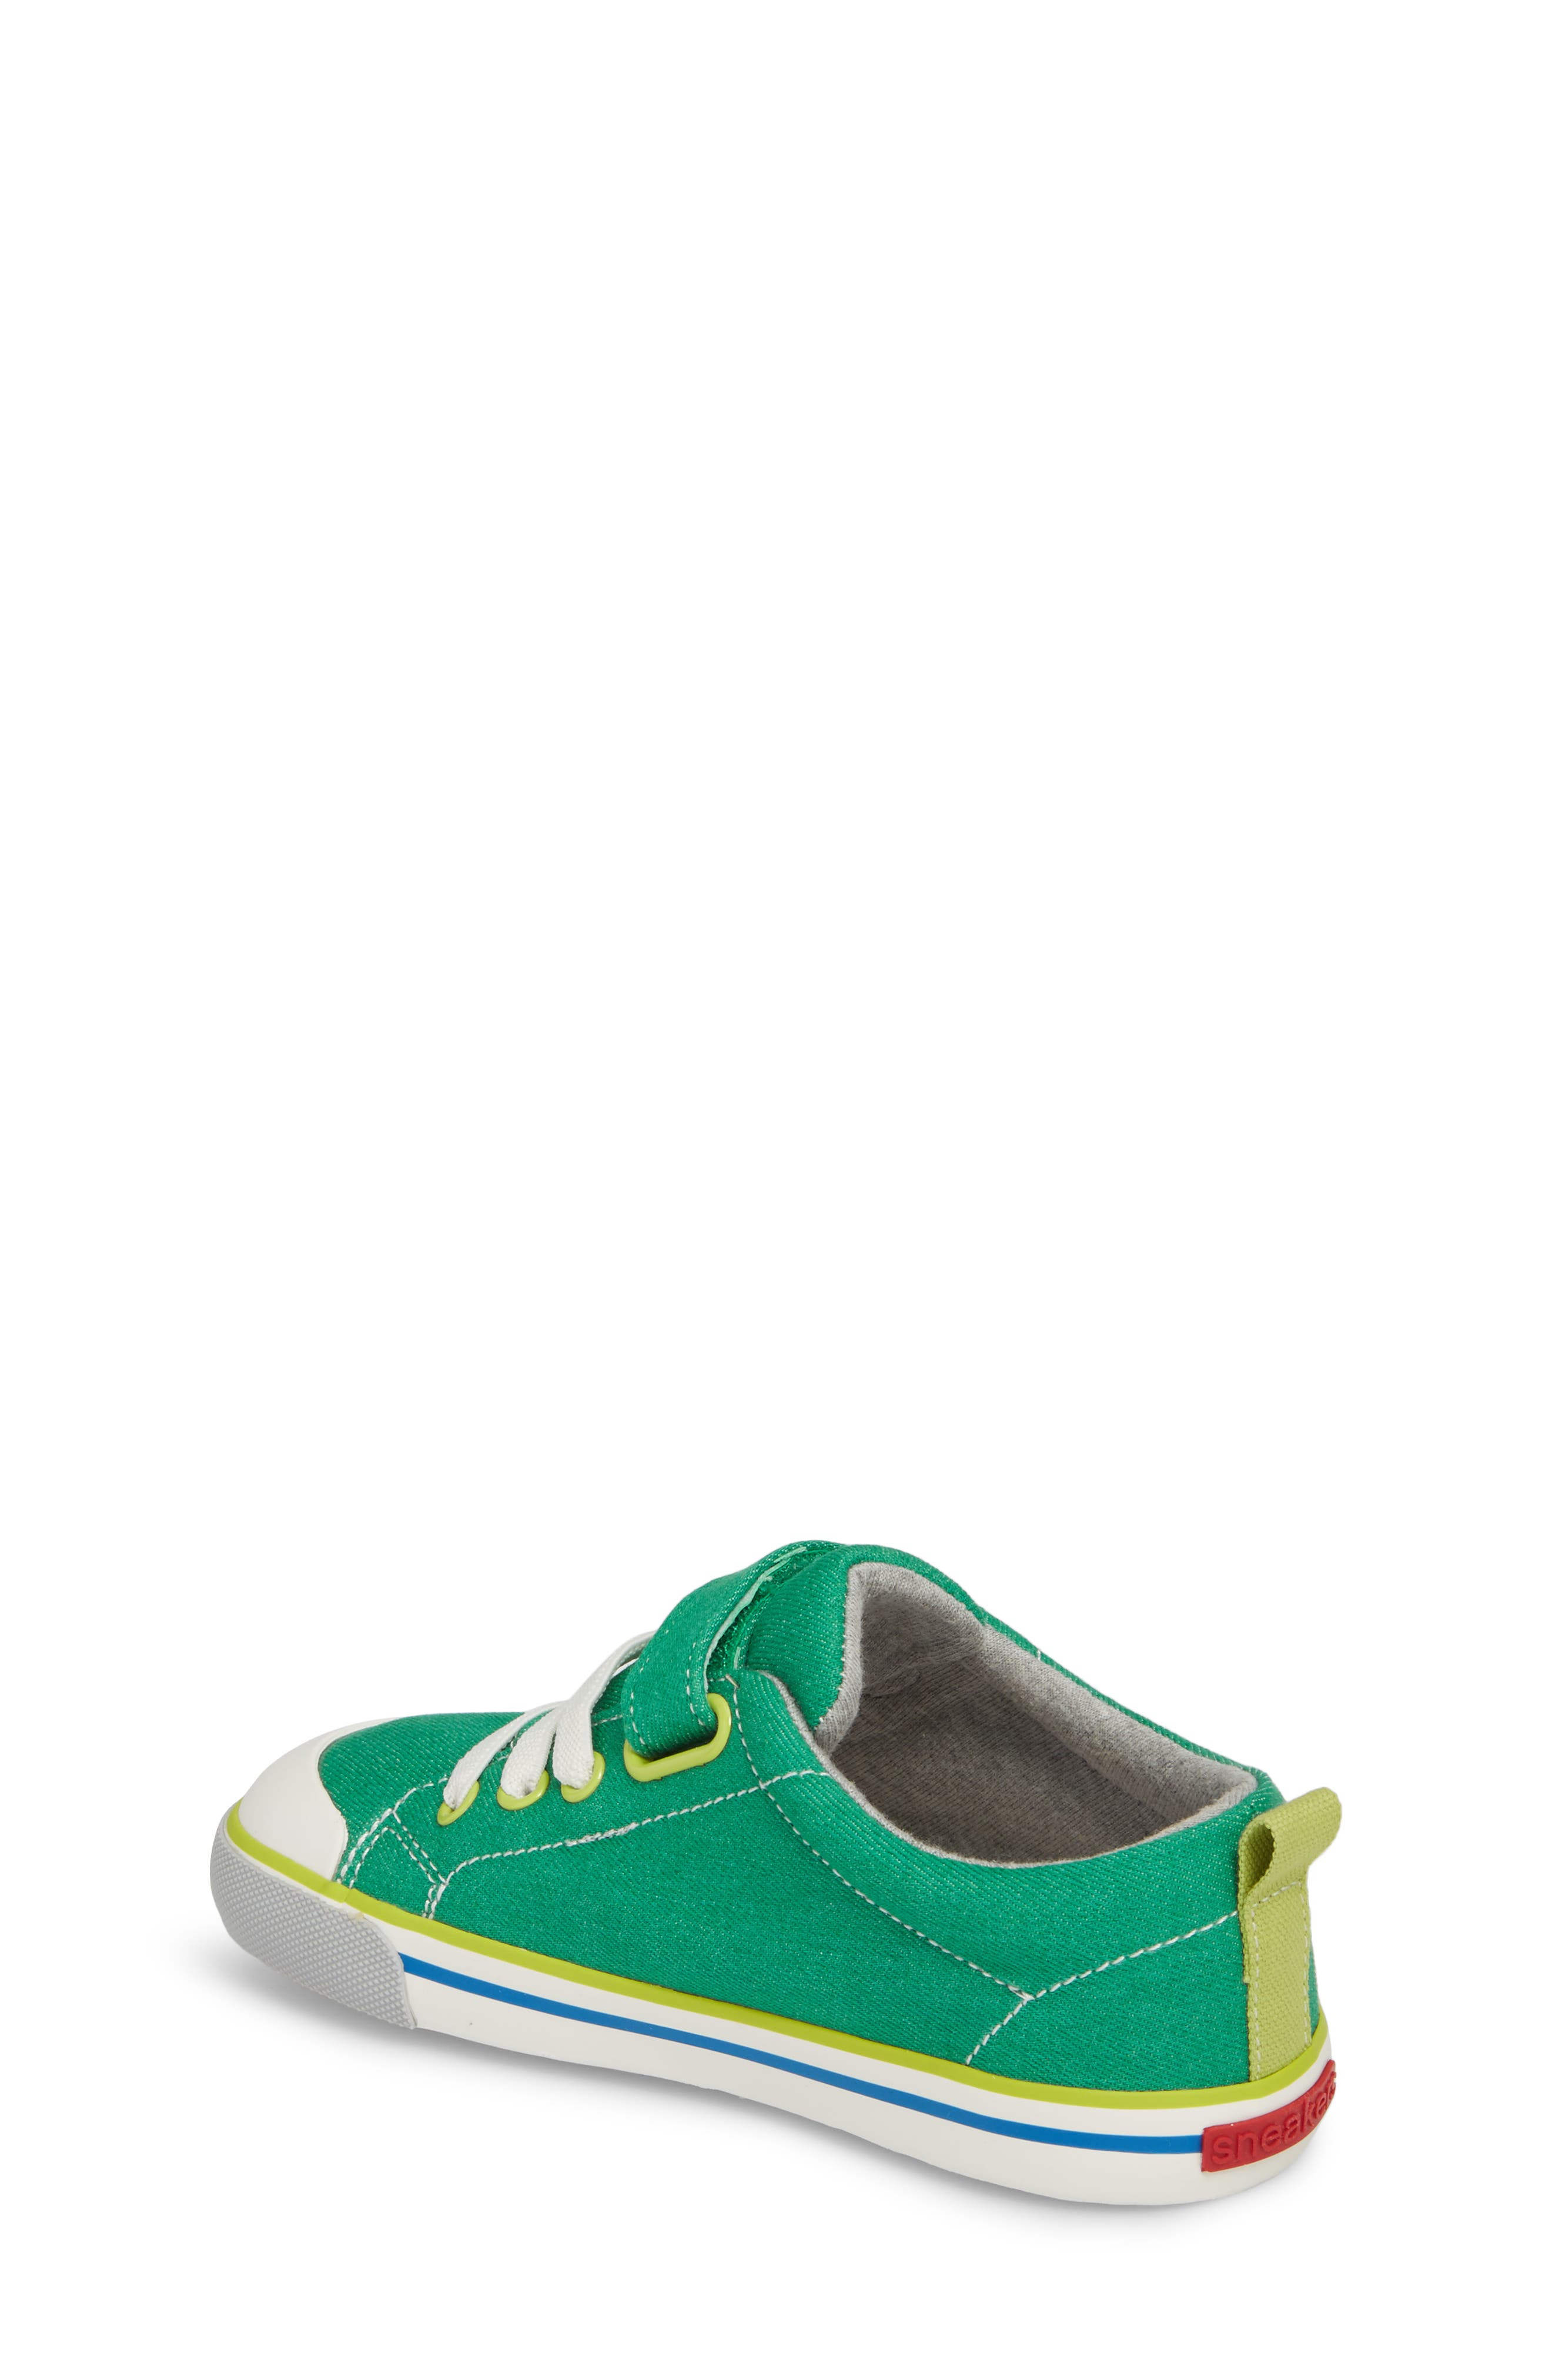 Alternate Image 2  - See Kai Run Stevie II Sneaker (Baby, Walker & Toddler)